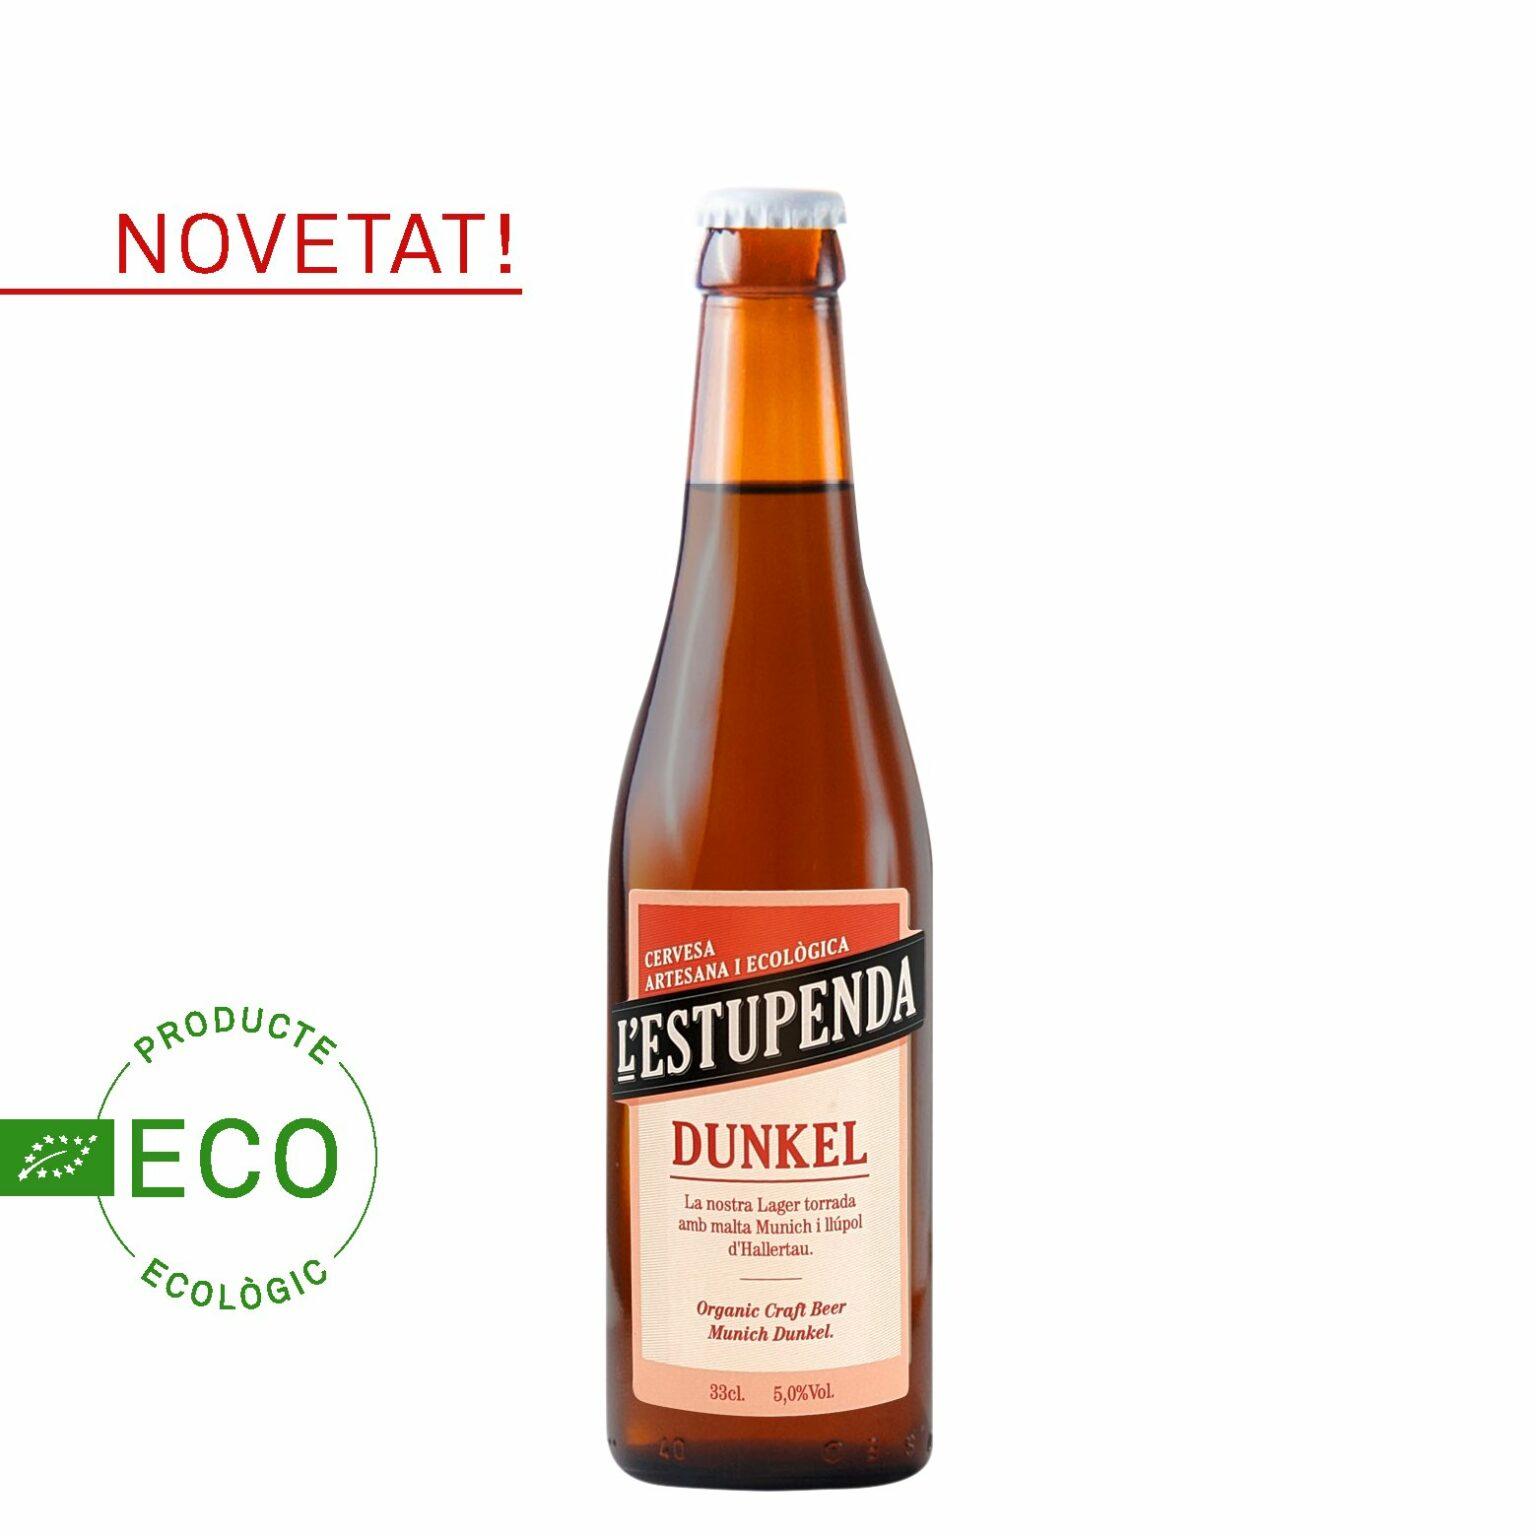 https://www.lestupenda.com/wp-content/uploads/2021/04/Cervesa-Artesana-Ecològica-lEstupenda-Dunkel-1-1536x1536.jpg